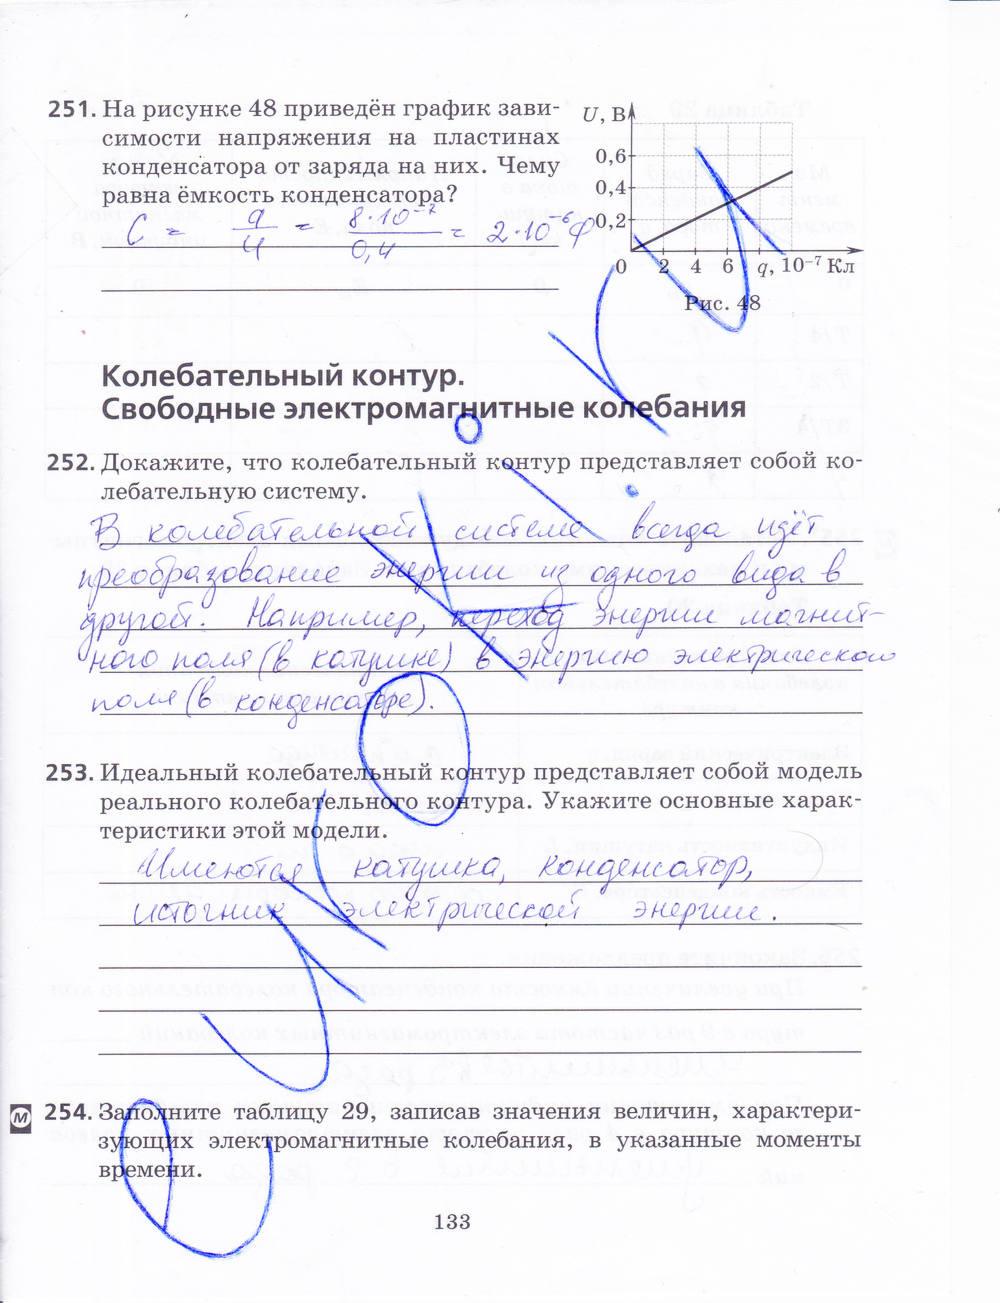 важаевский 8 класс решебник пурышева, 2019 н.е онлайн н.с